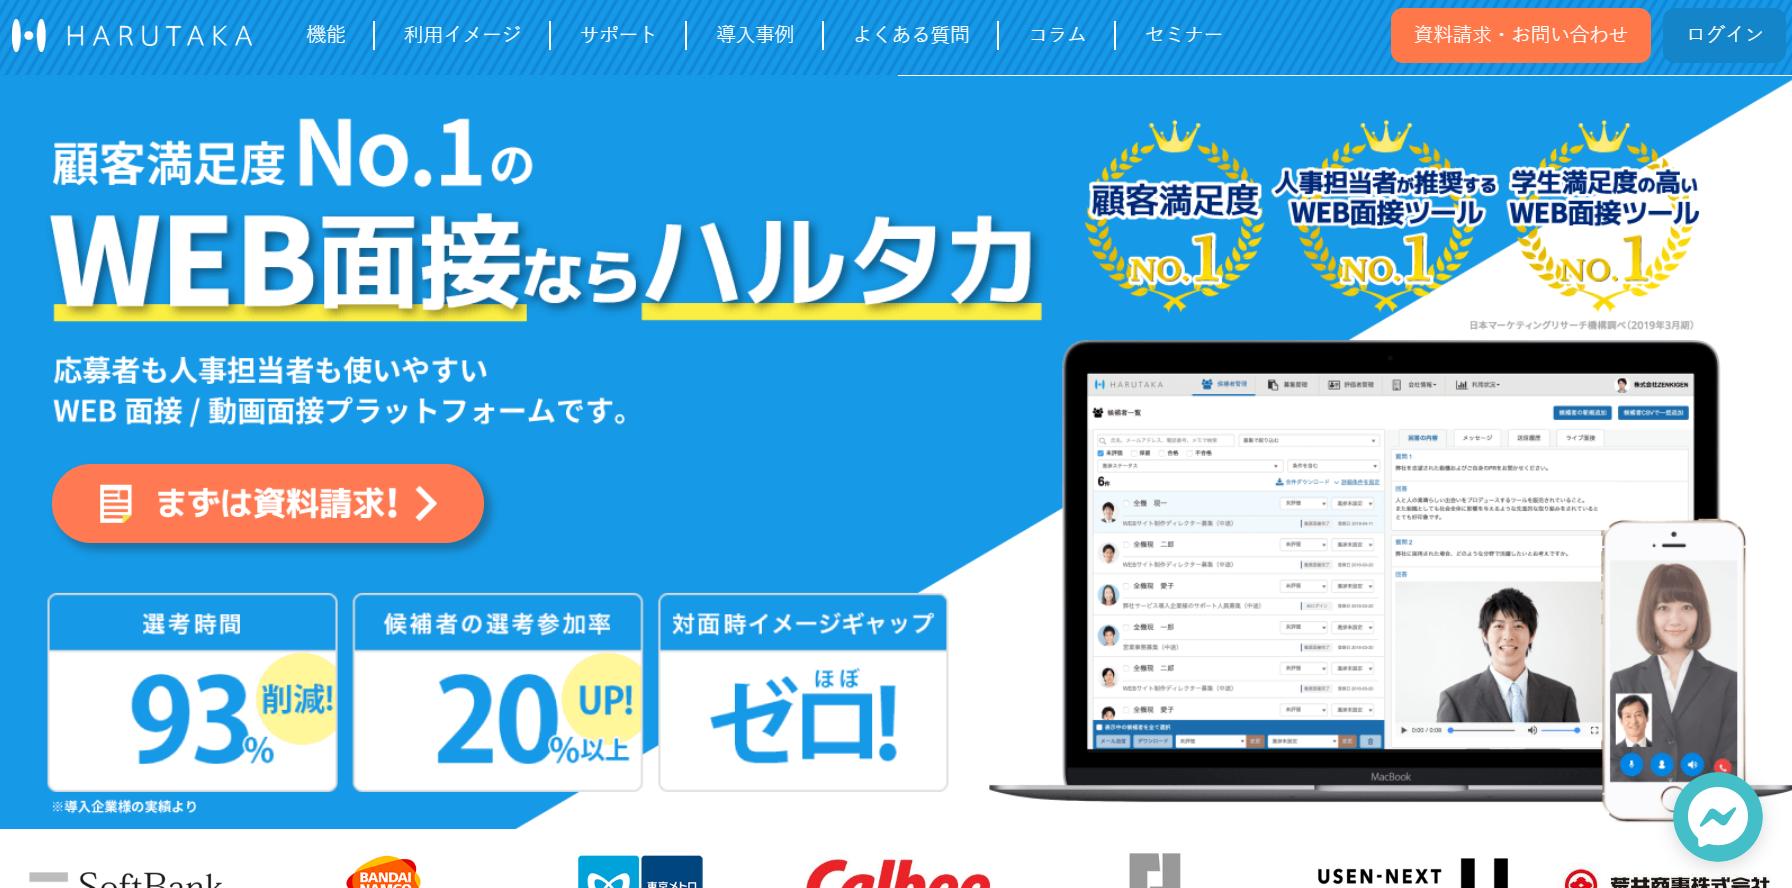 WEB面接プラットフォーム HARUTAKA